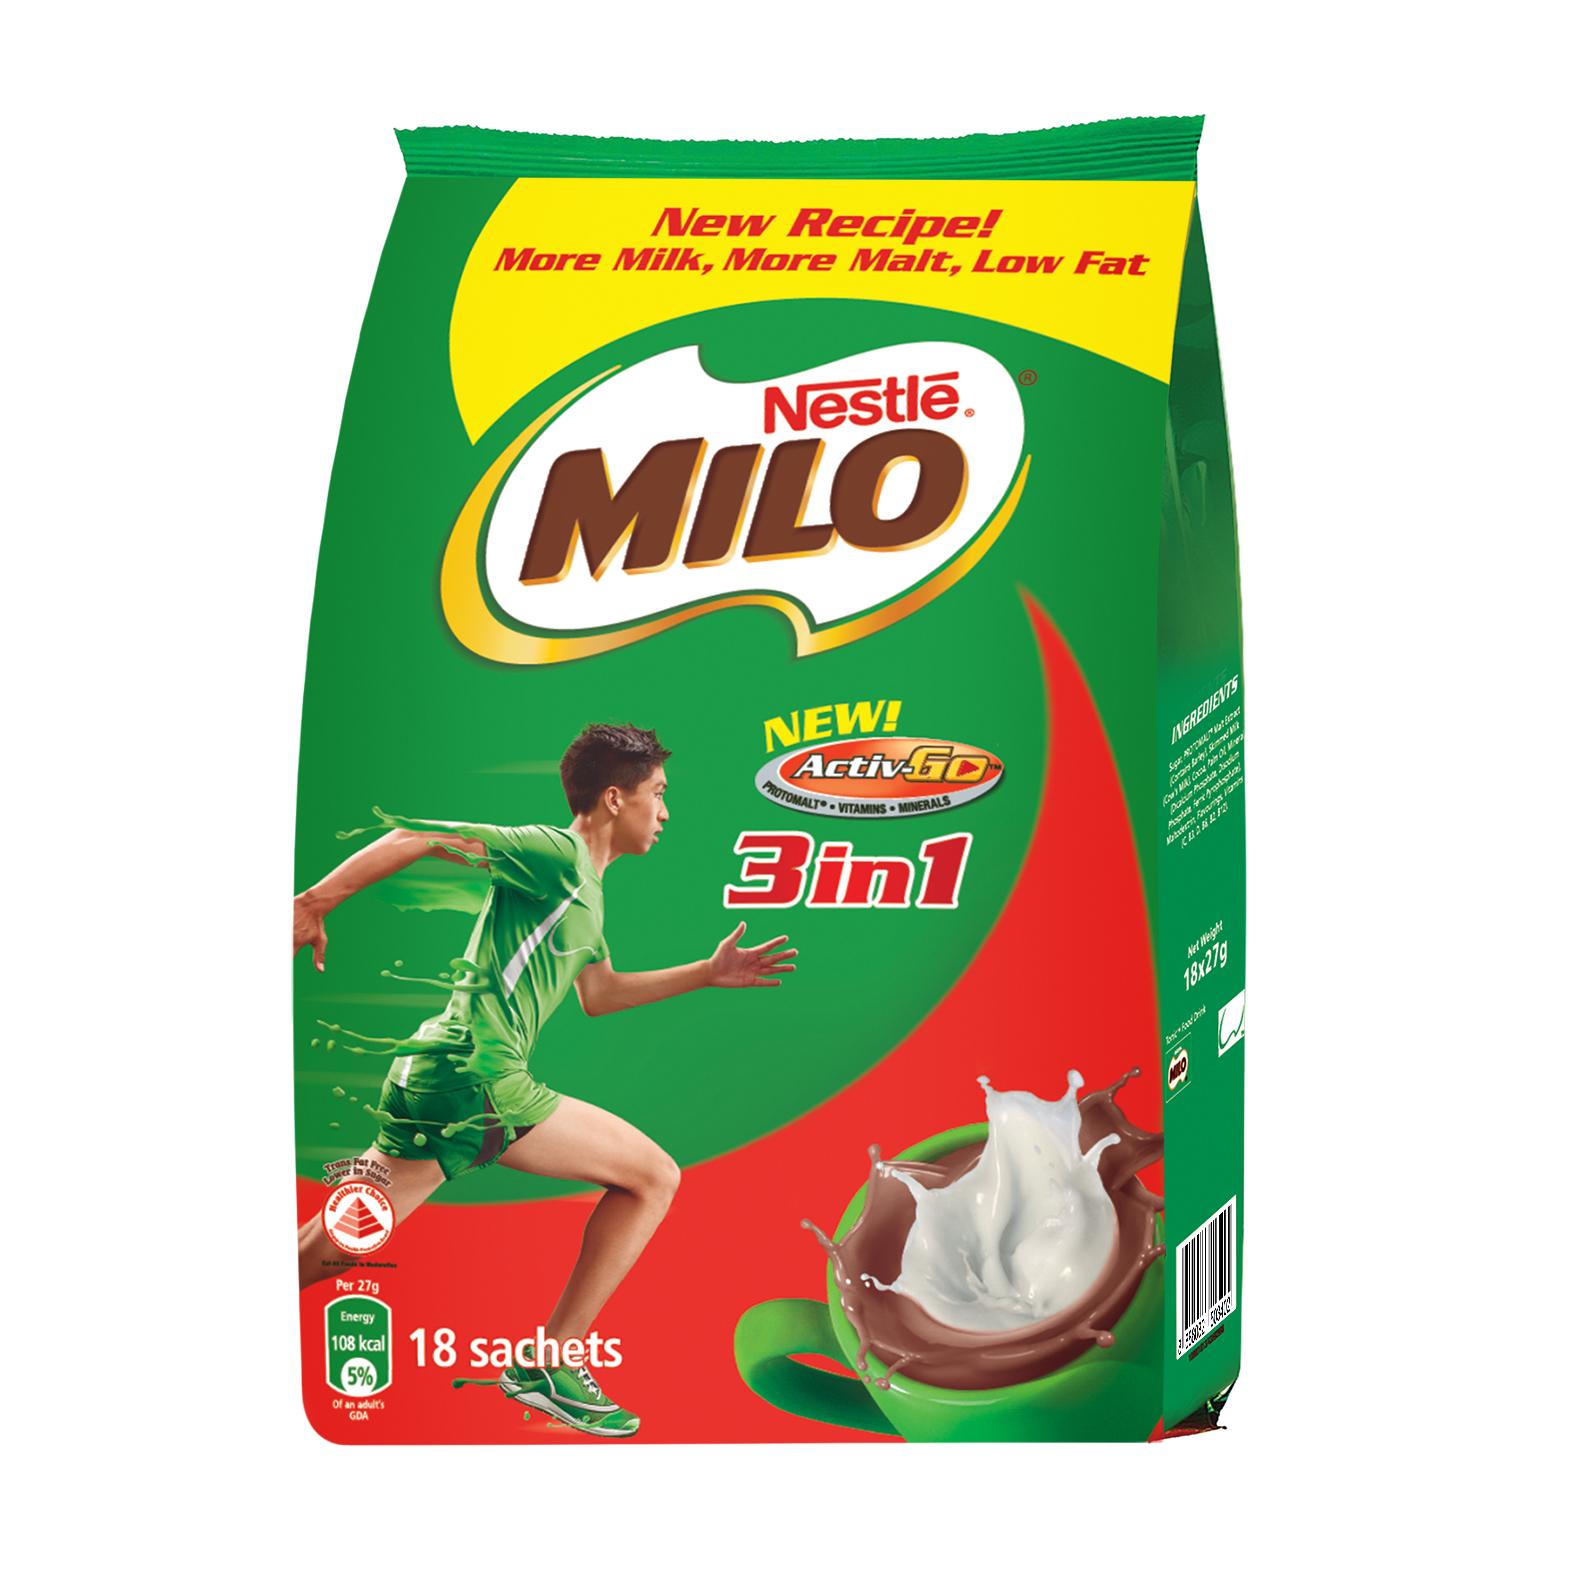 Milo Activ-Go 3-in-1 18s X 27g